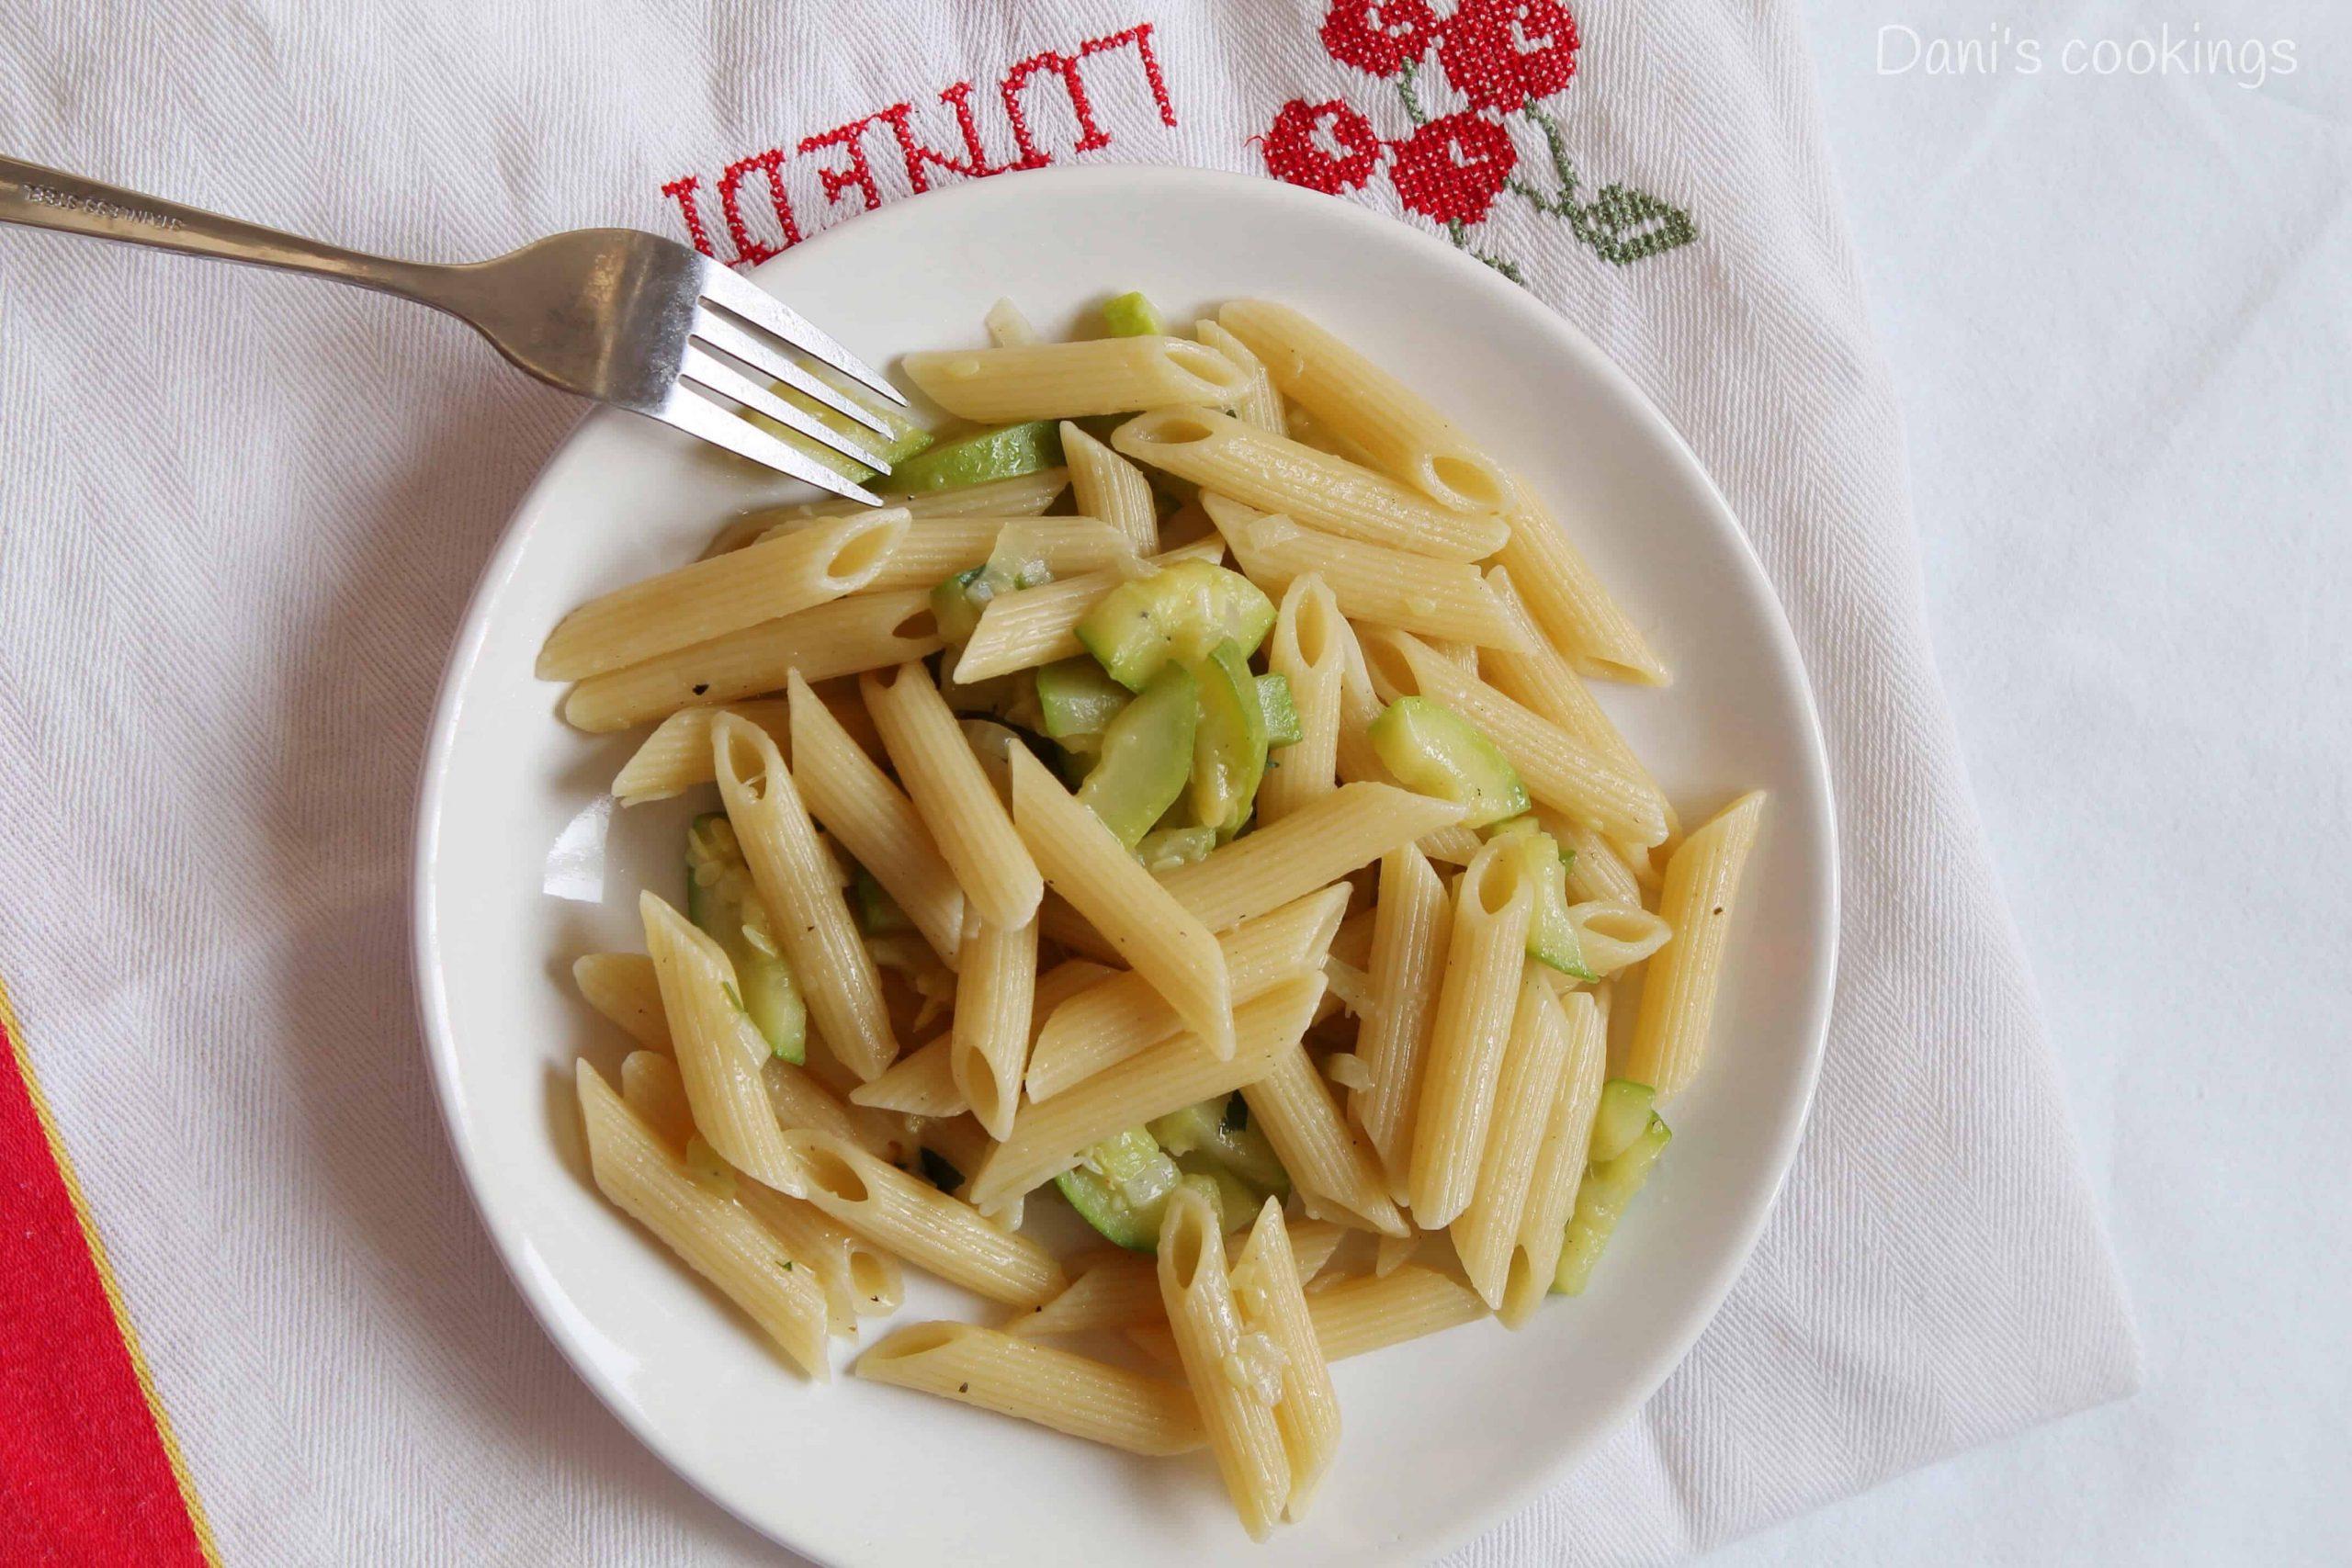 pasta with zucchini sauté - daniscookings.wordpress.com